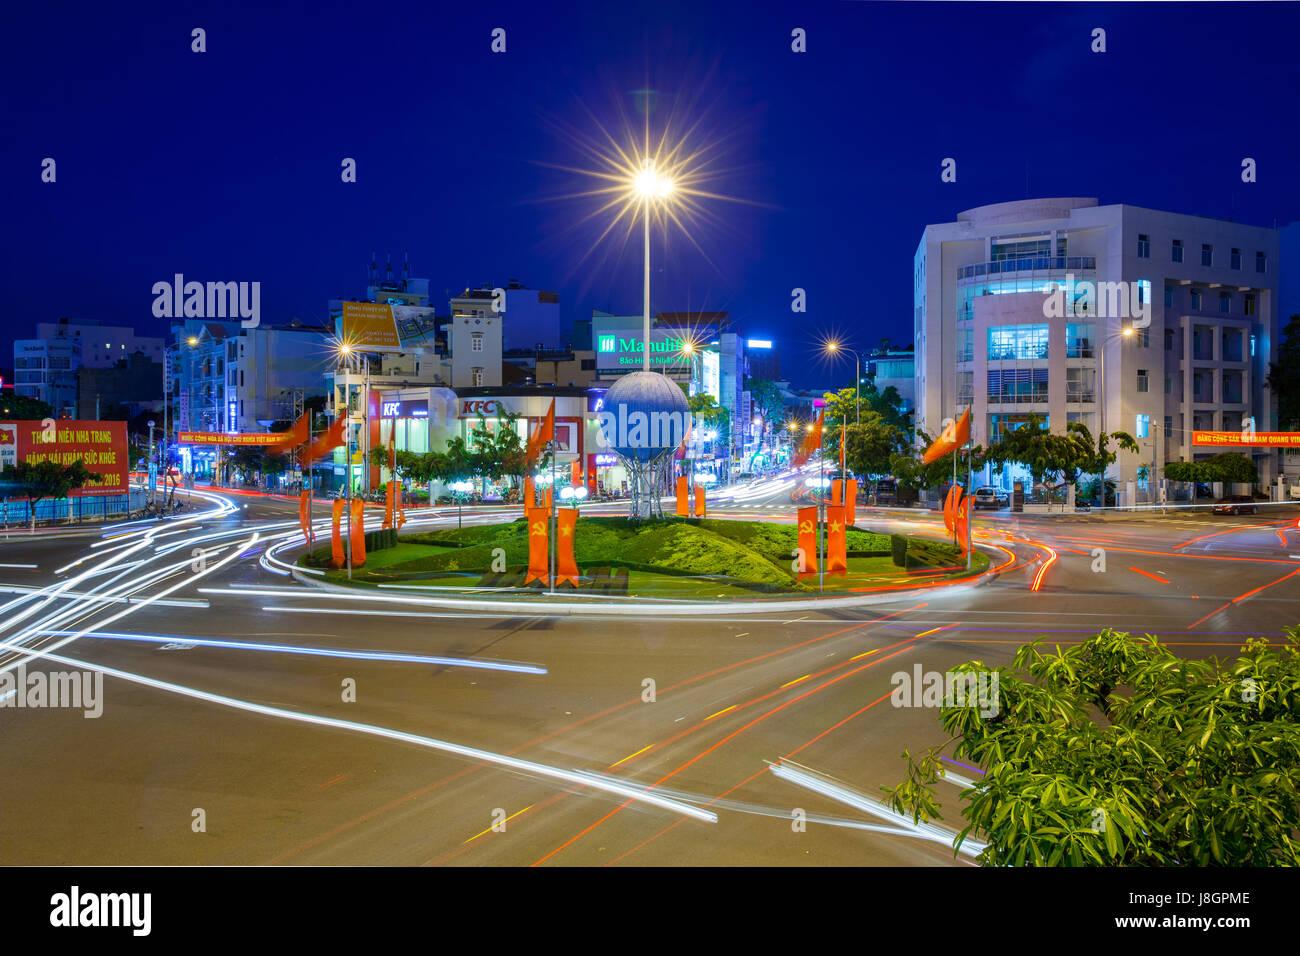 Nha Trang, Vietnam - 23. Dezember 2015: Dämmerung Blick auf den Kreisverkehr in der Mitte von Nha Trang Stadt Stockbild